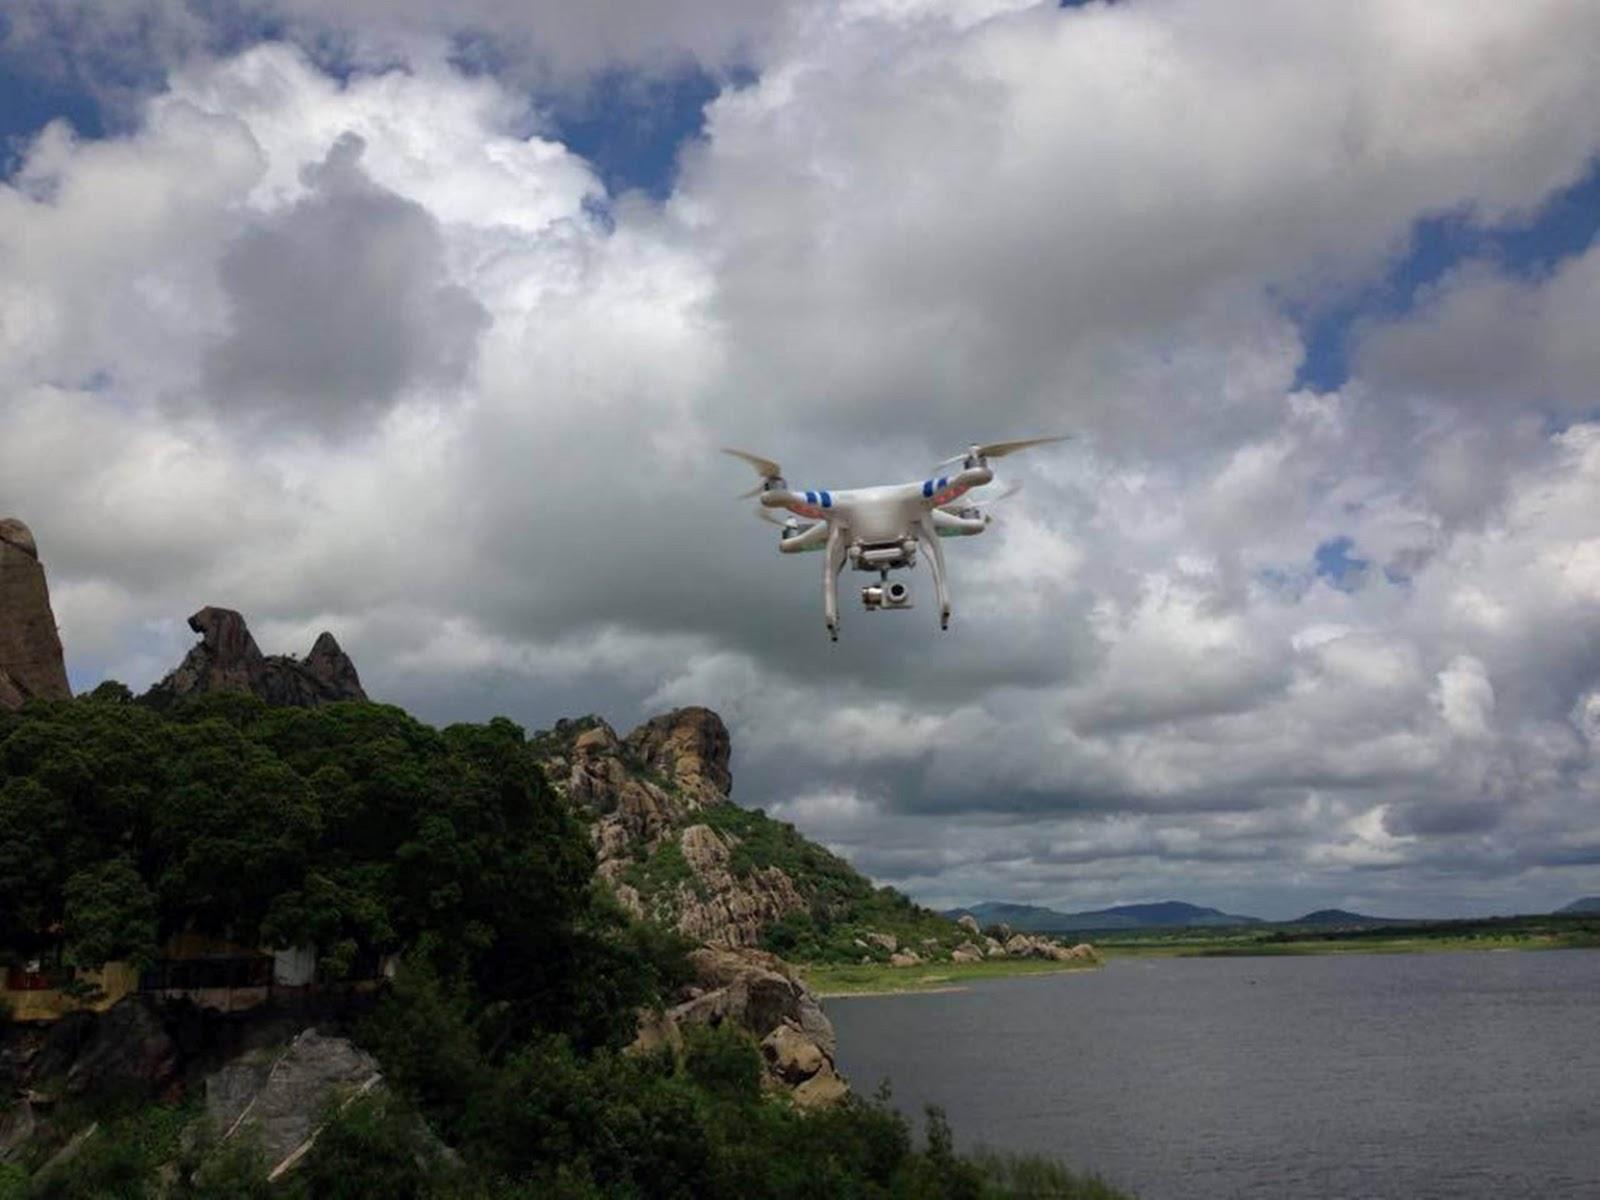 drone dji discount  | 740 x 416